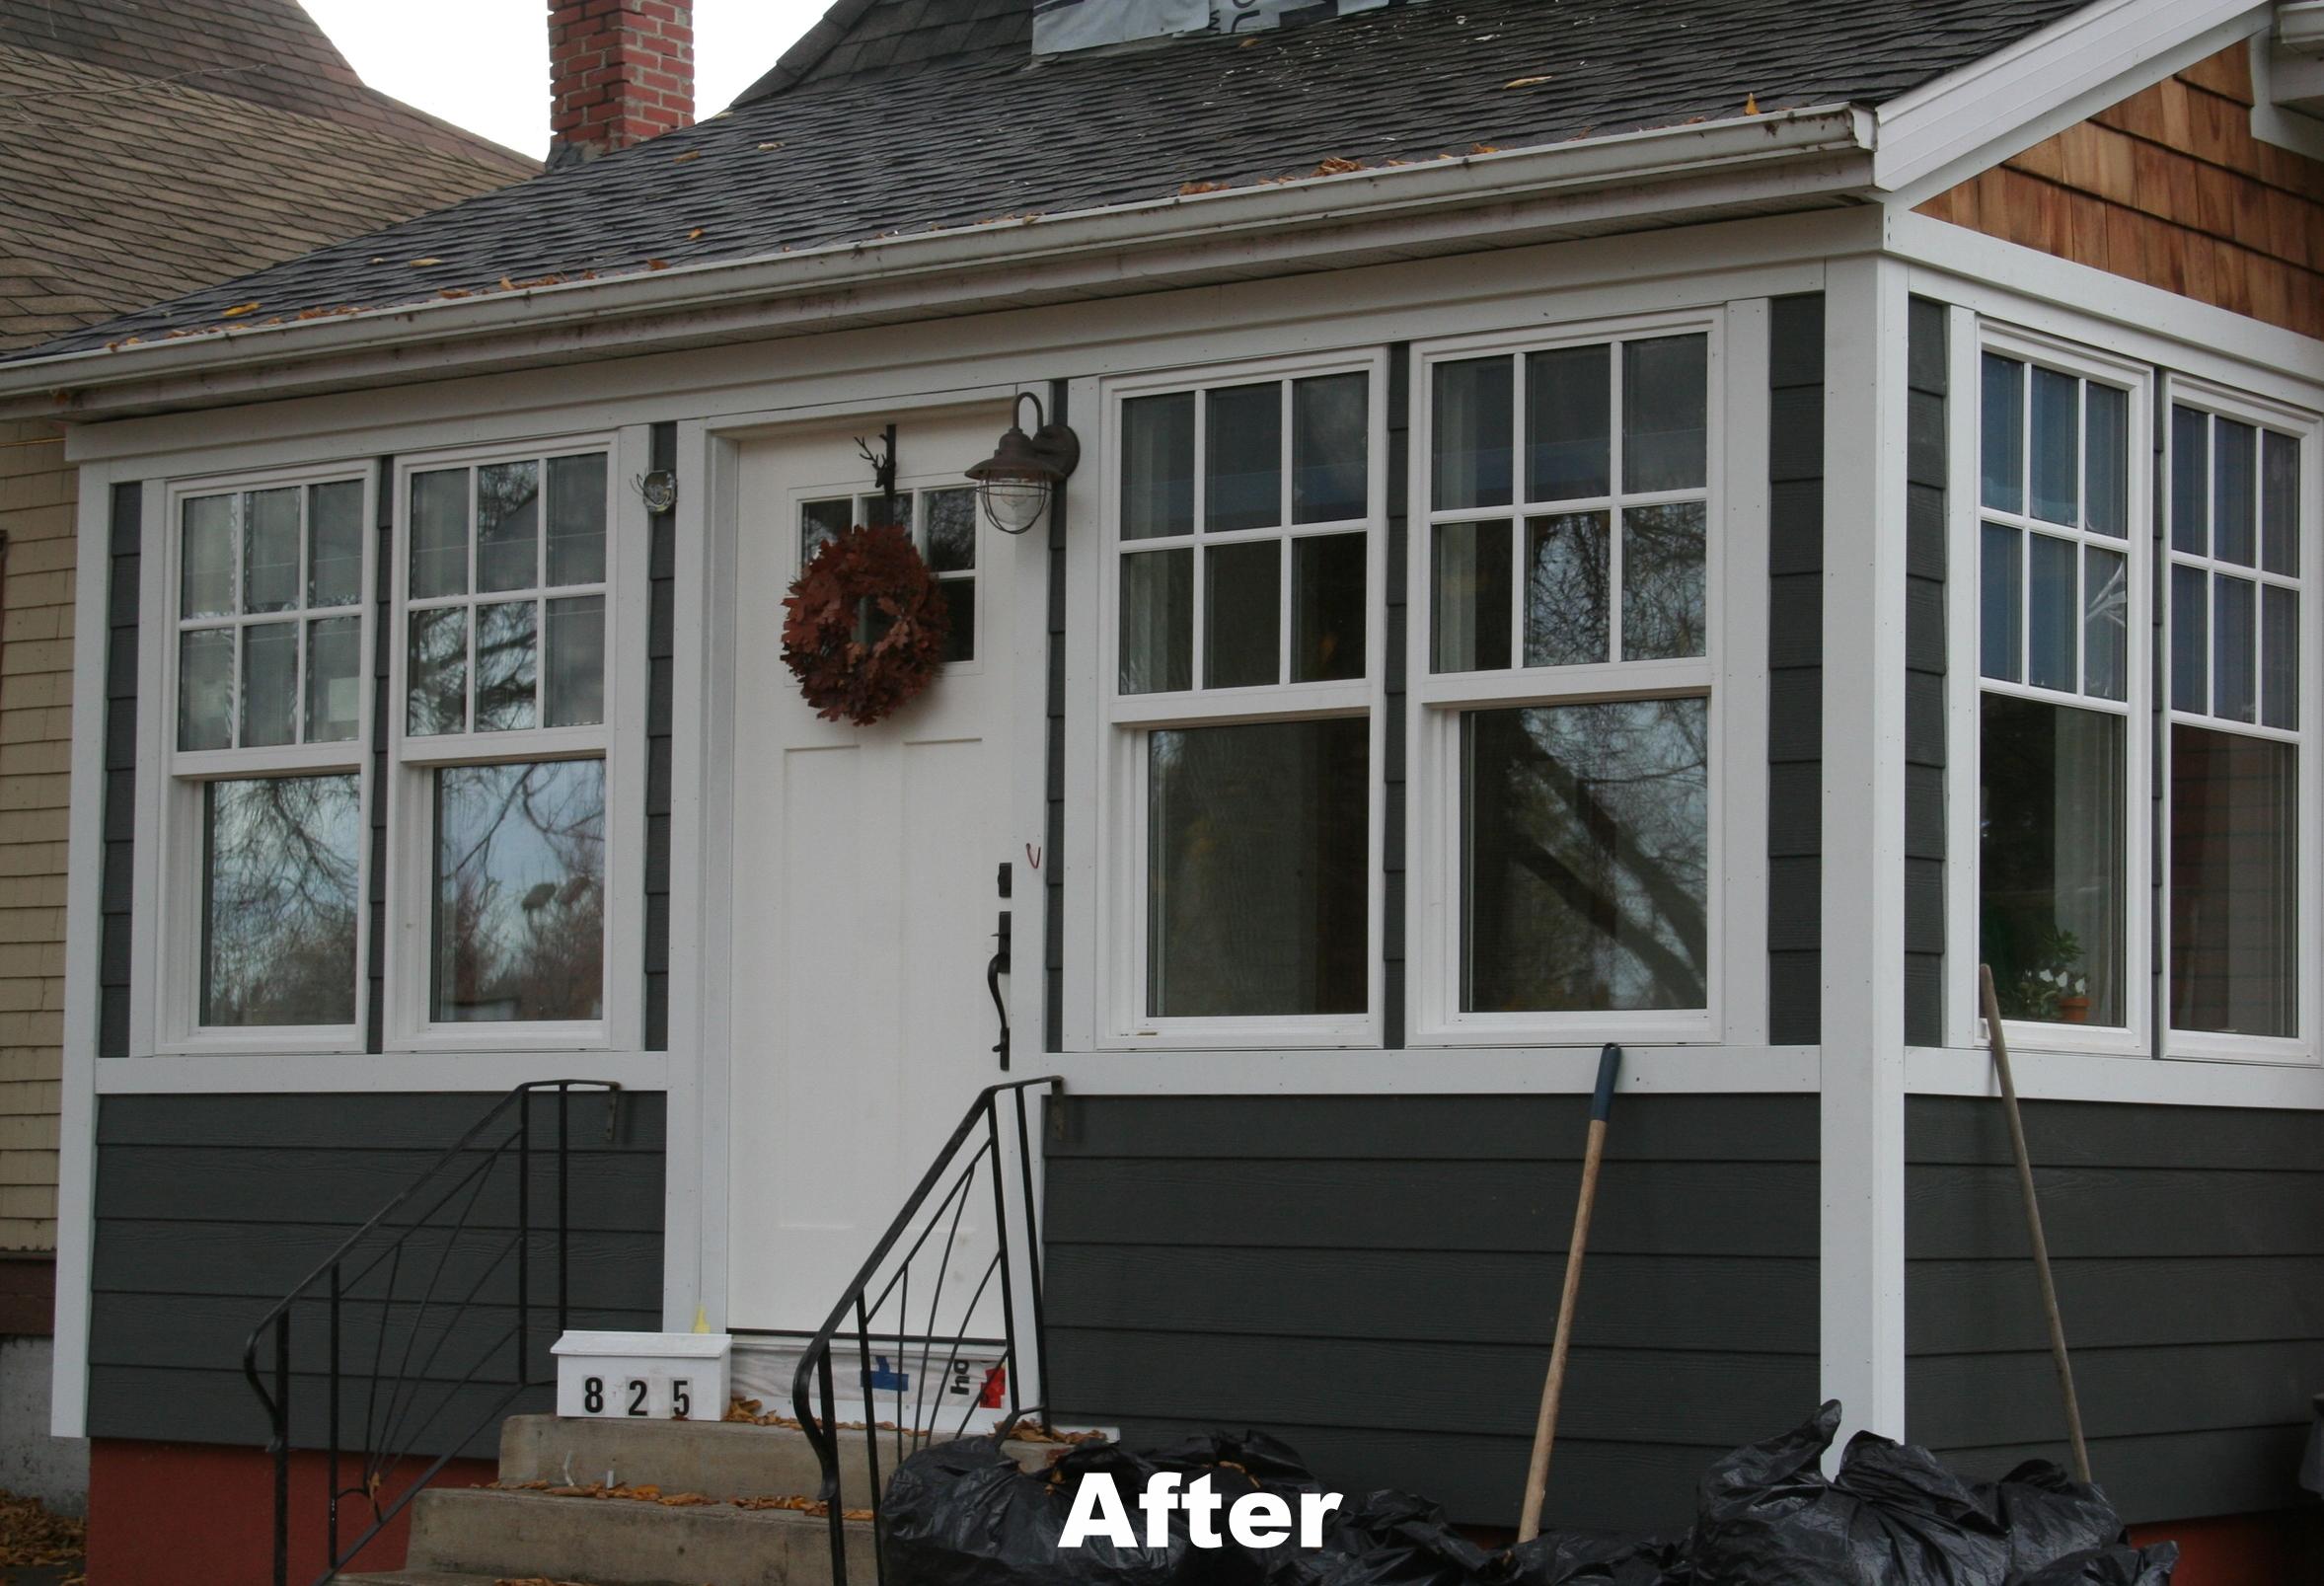 Calow saskatoon renovation contractor siding remodel exterior windowa.JPG